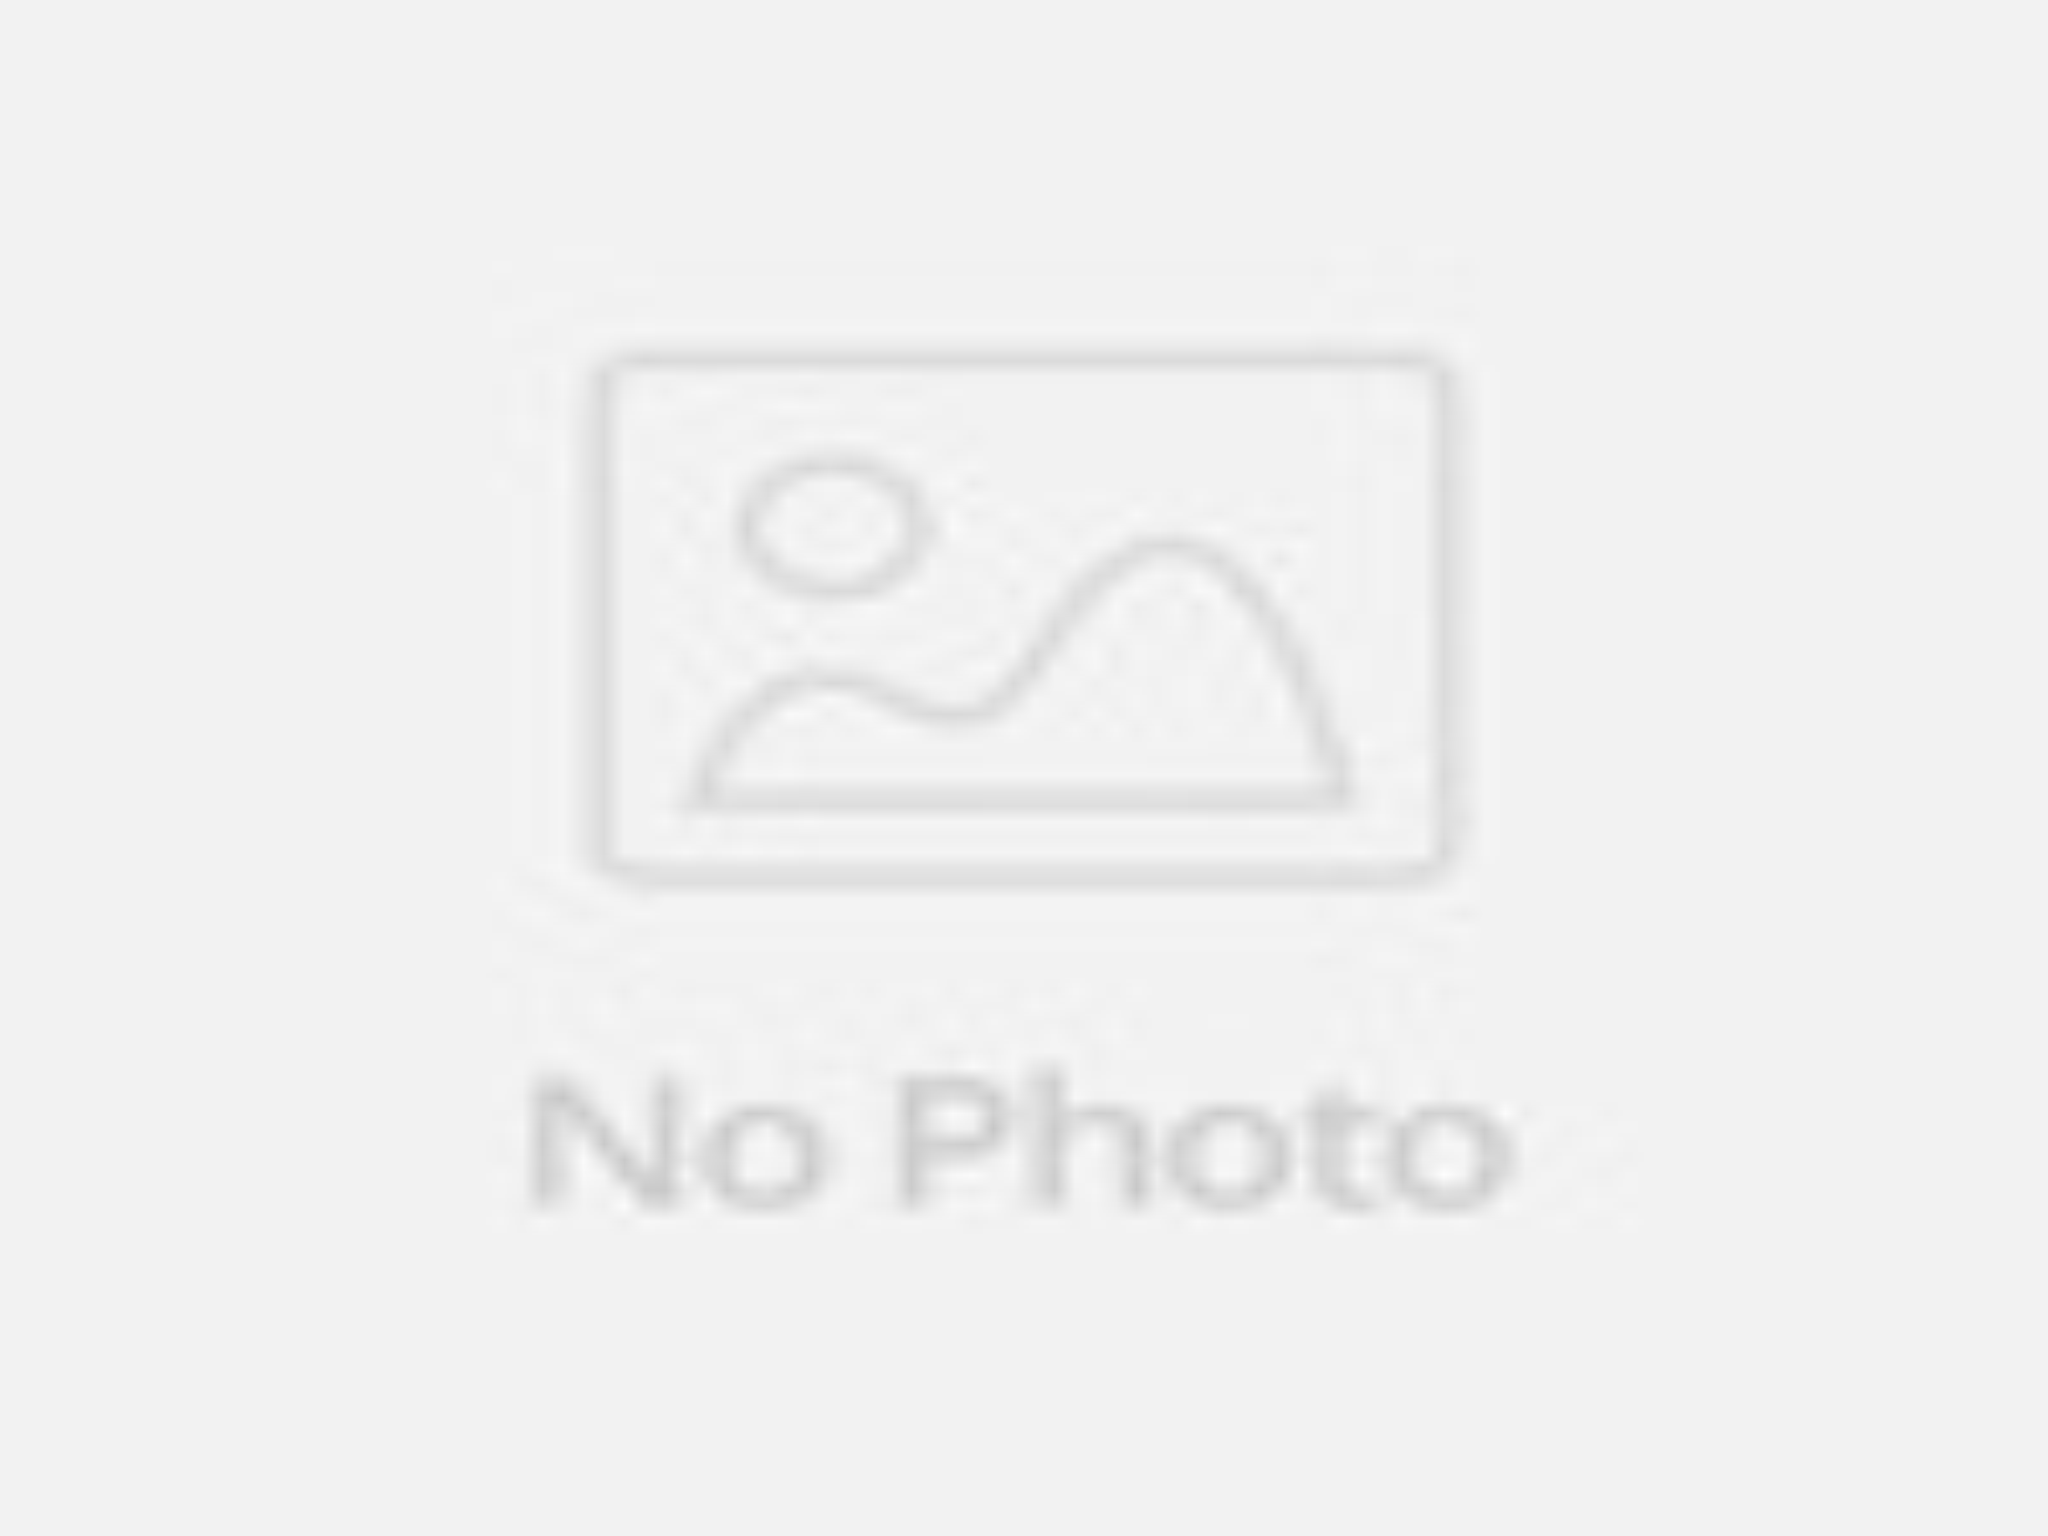 Aluminium Single Angle